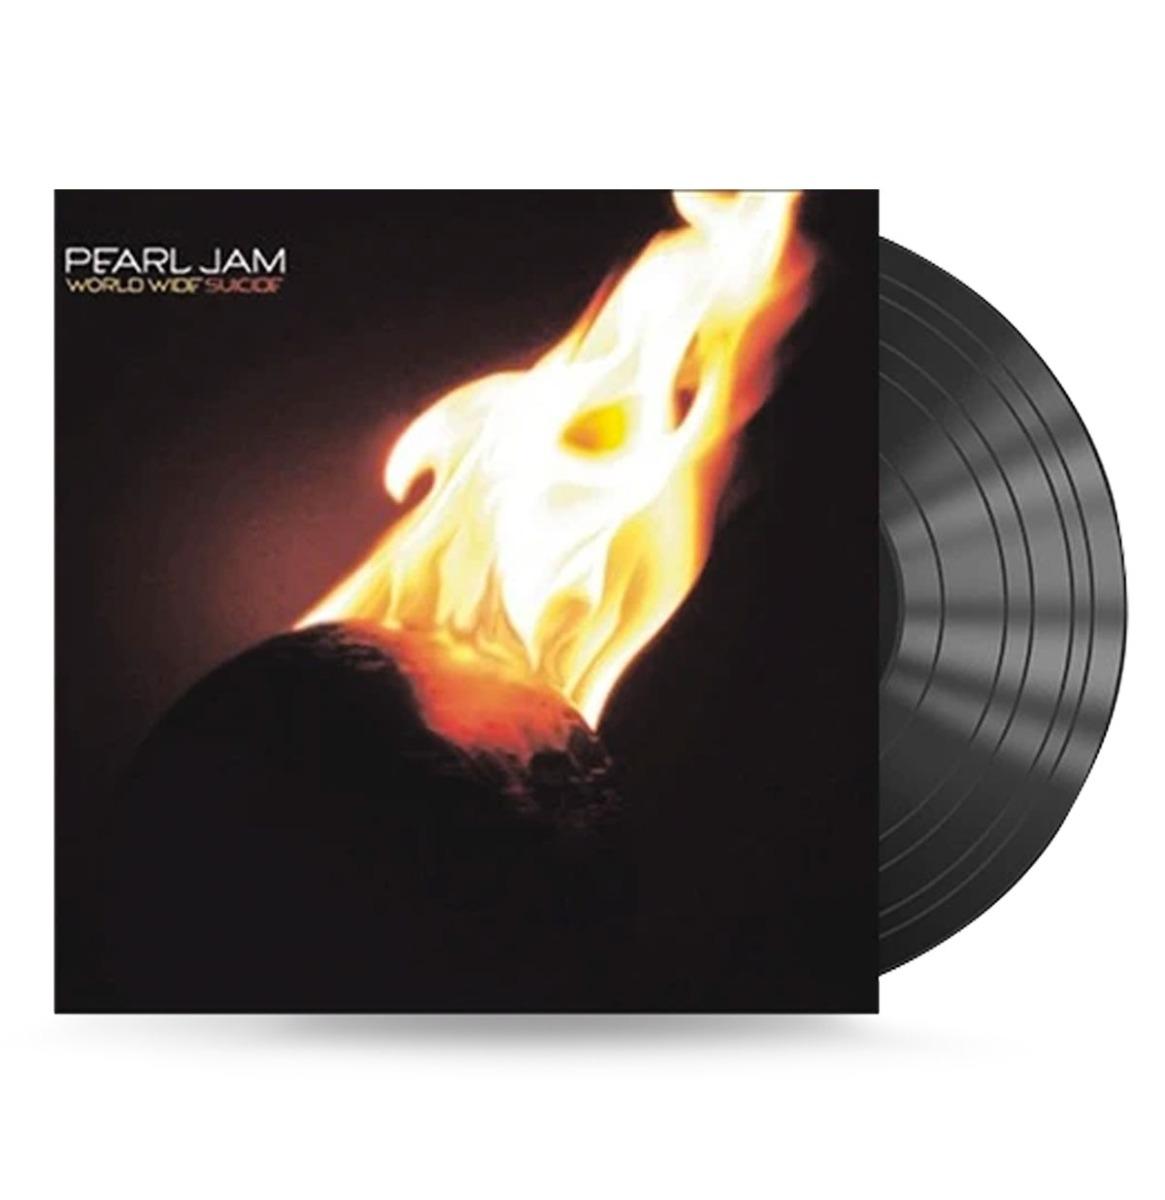 Pearl Jam - World Wide Suicide 7 Inch Vinyl Single